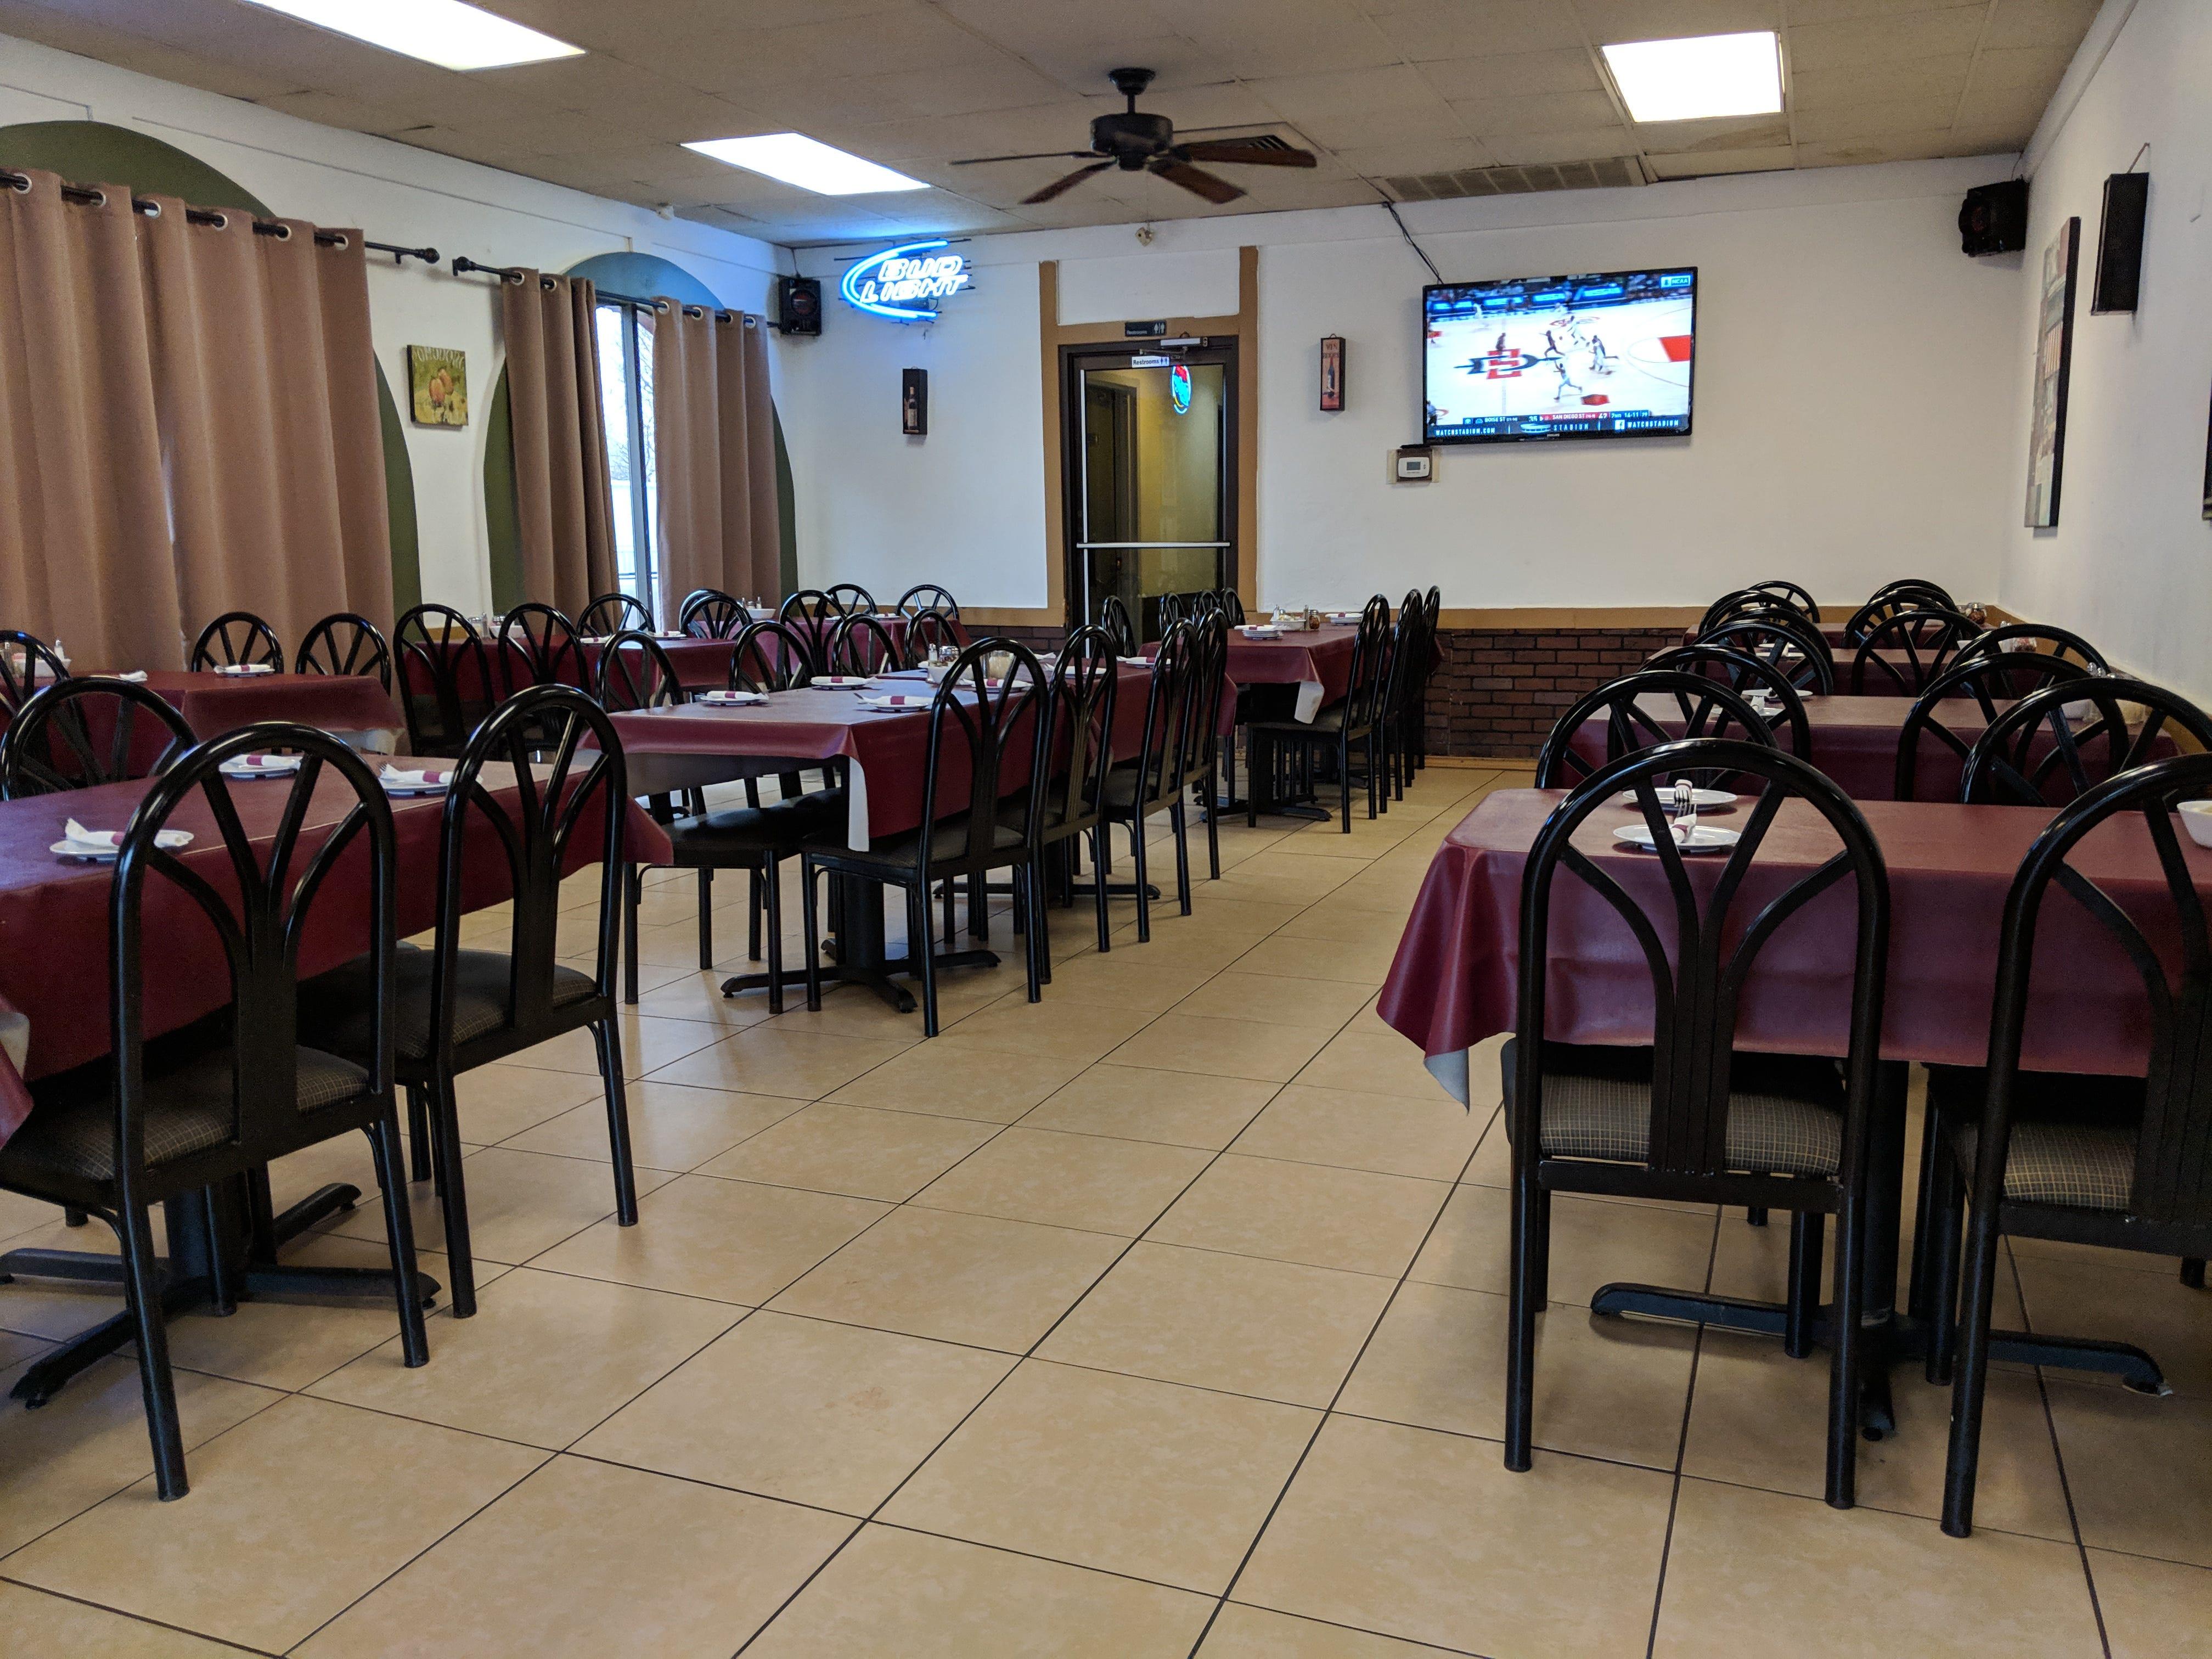 Inside Napoli's Italian Restaurant.